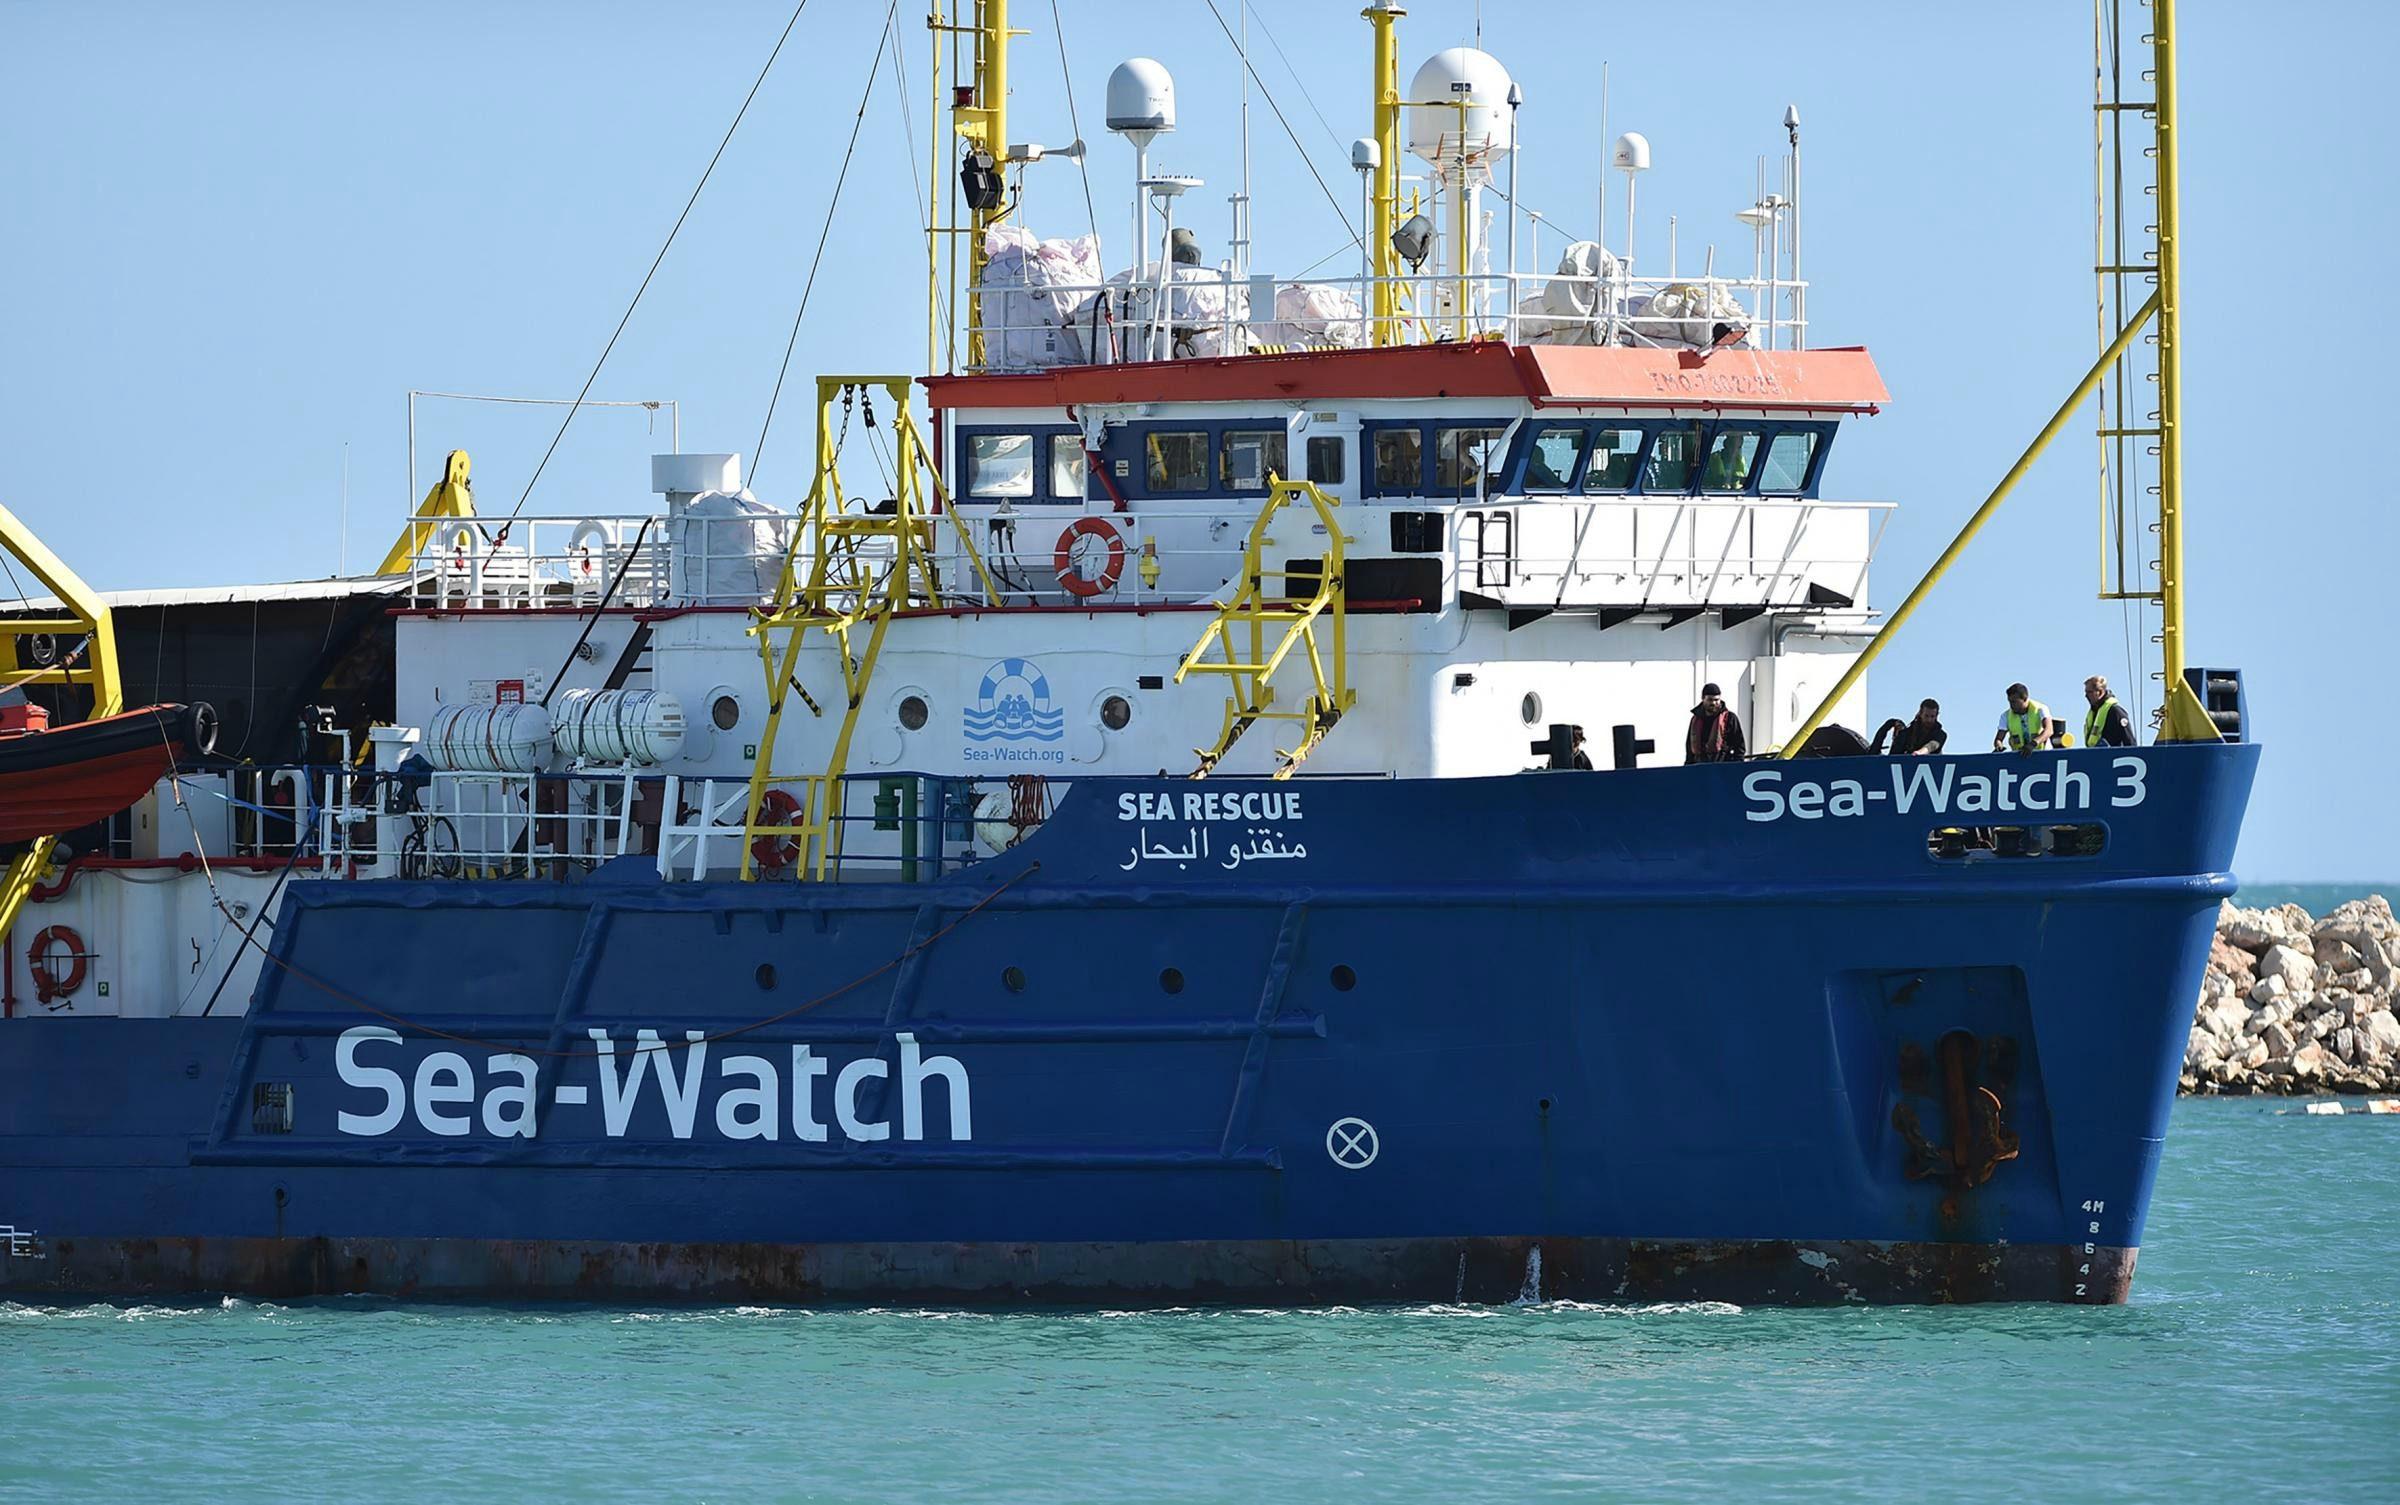 sea watch - photo #13